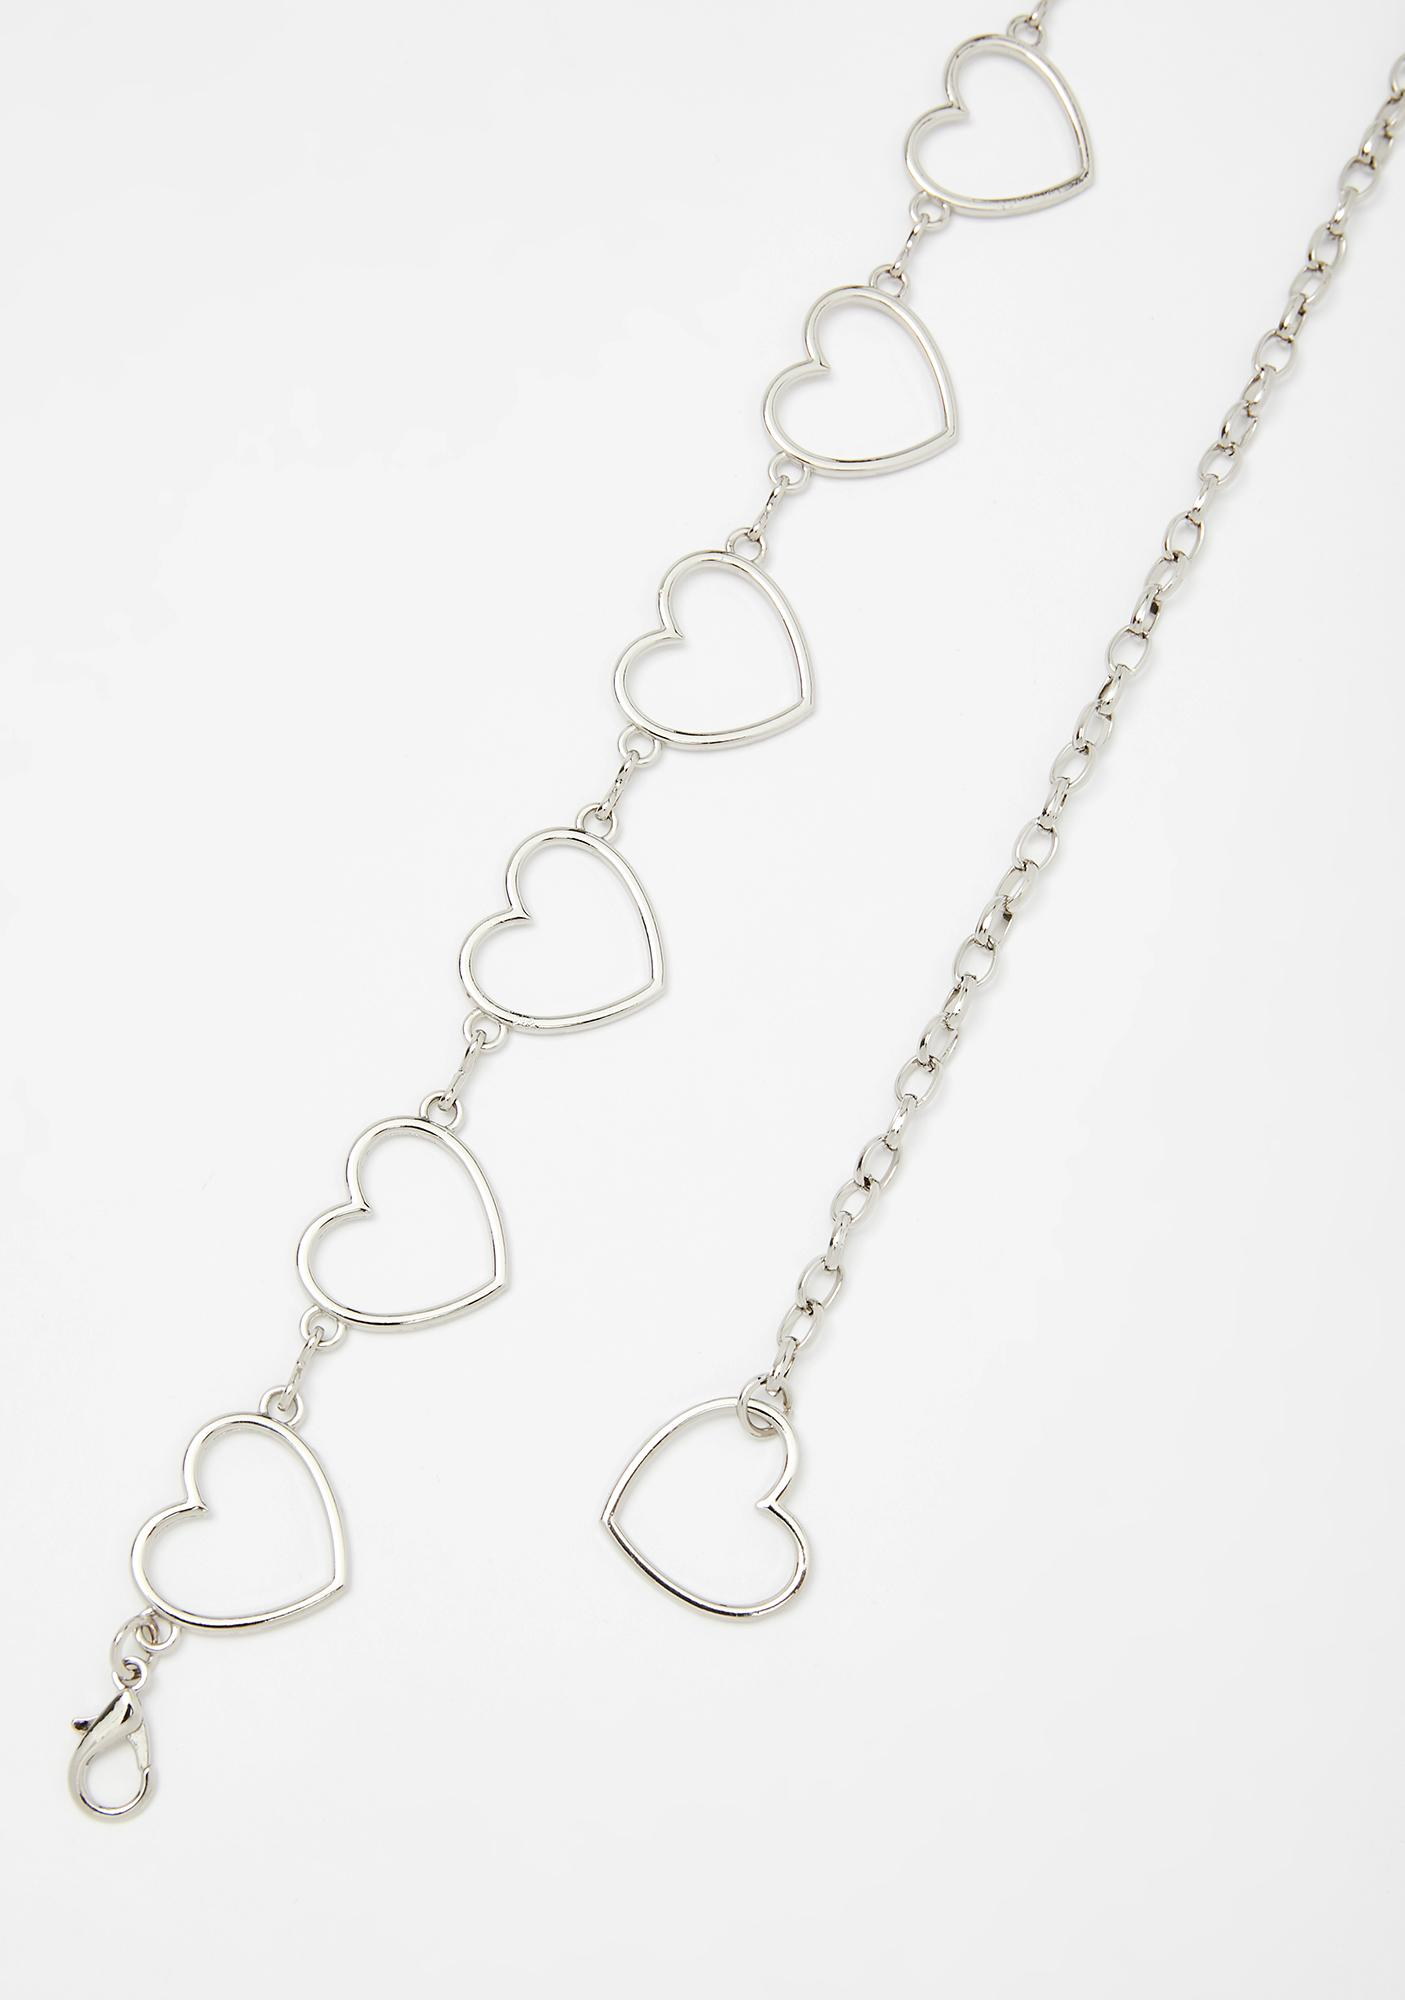 Heartless N' Heauxin' Chain Belt